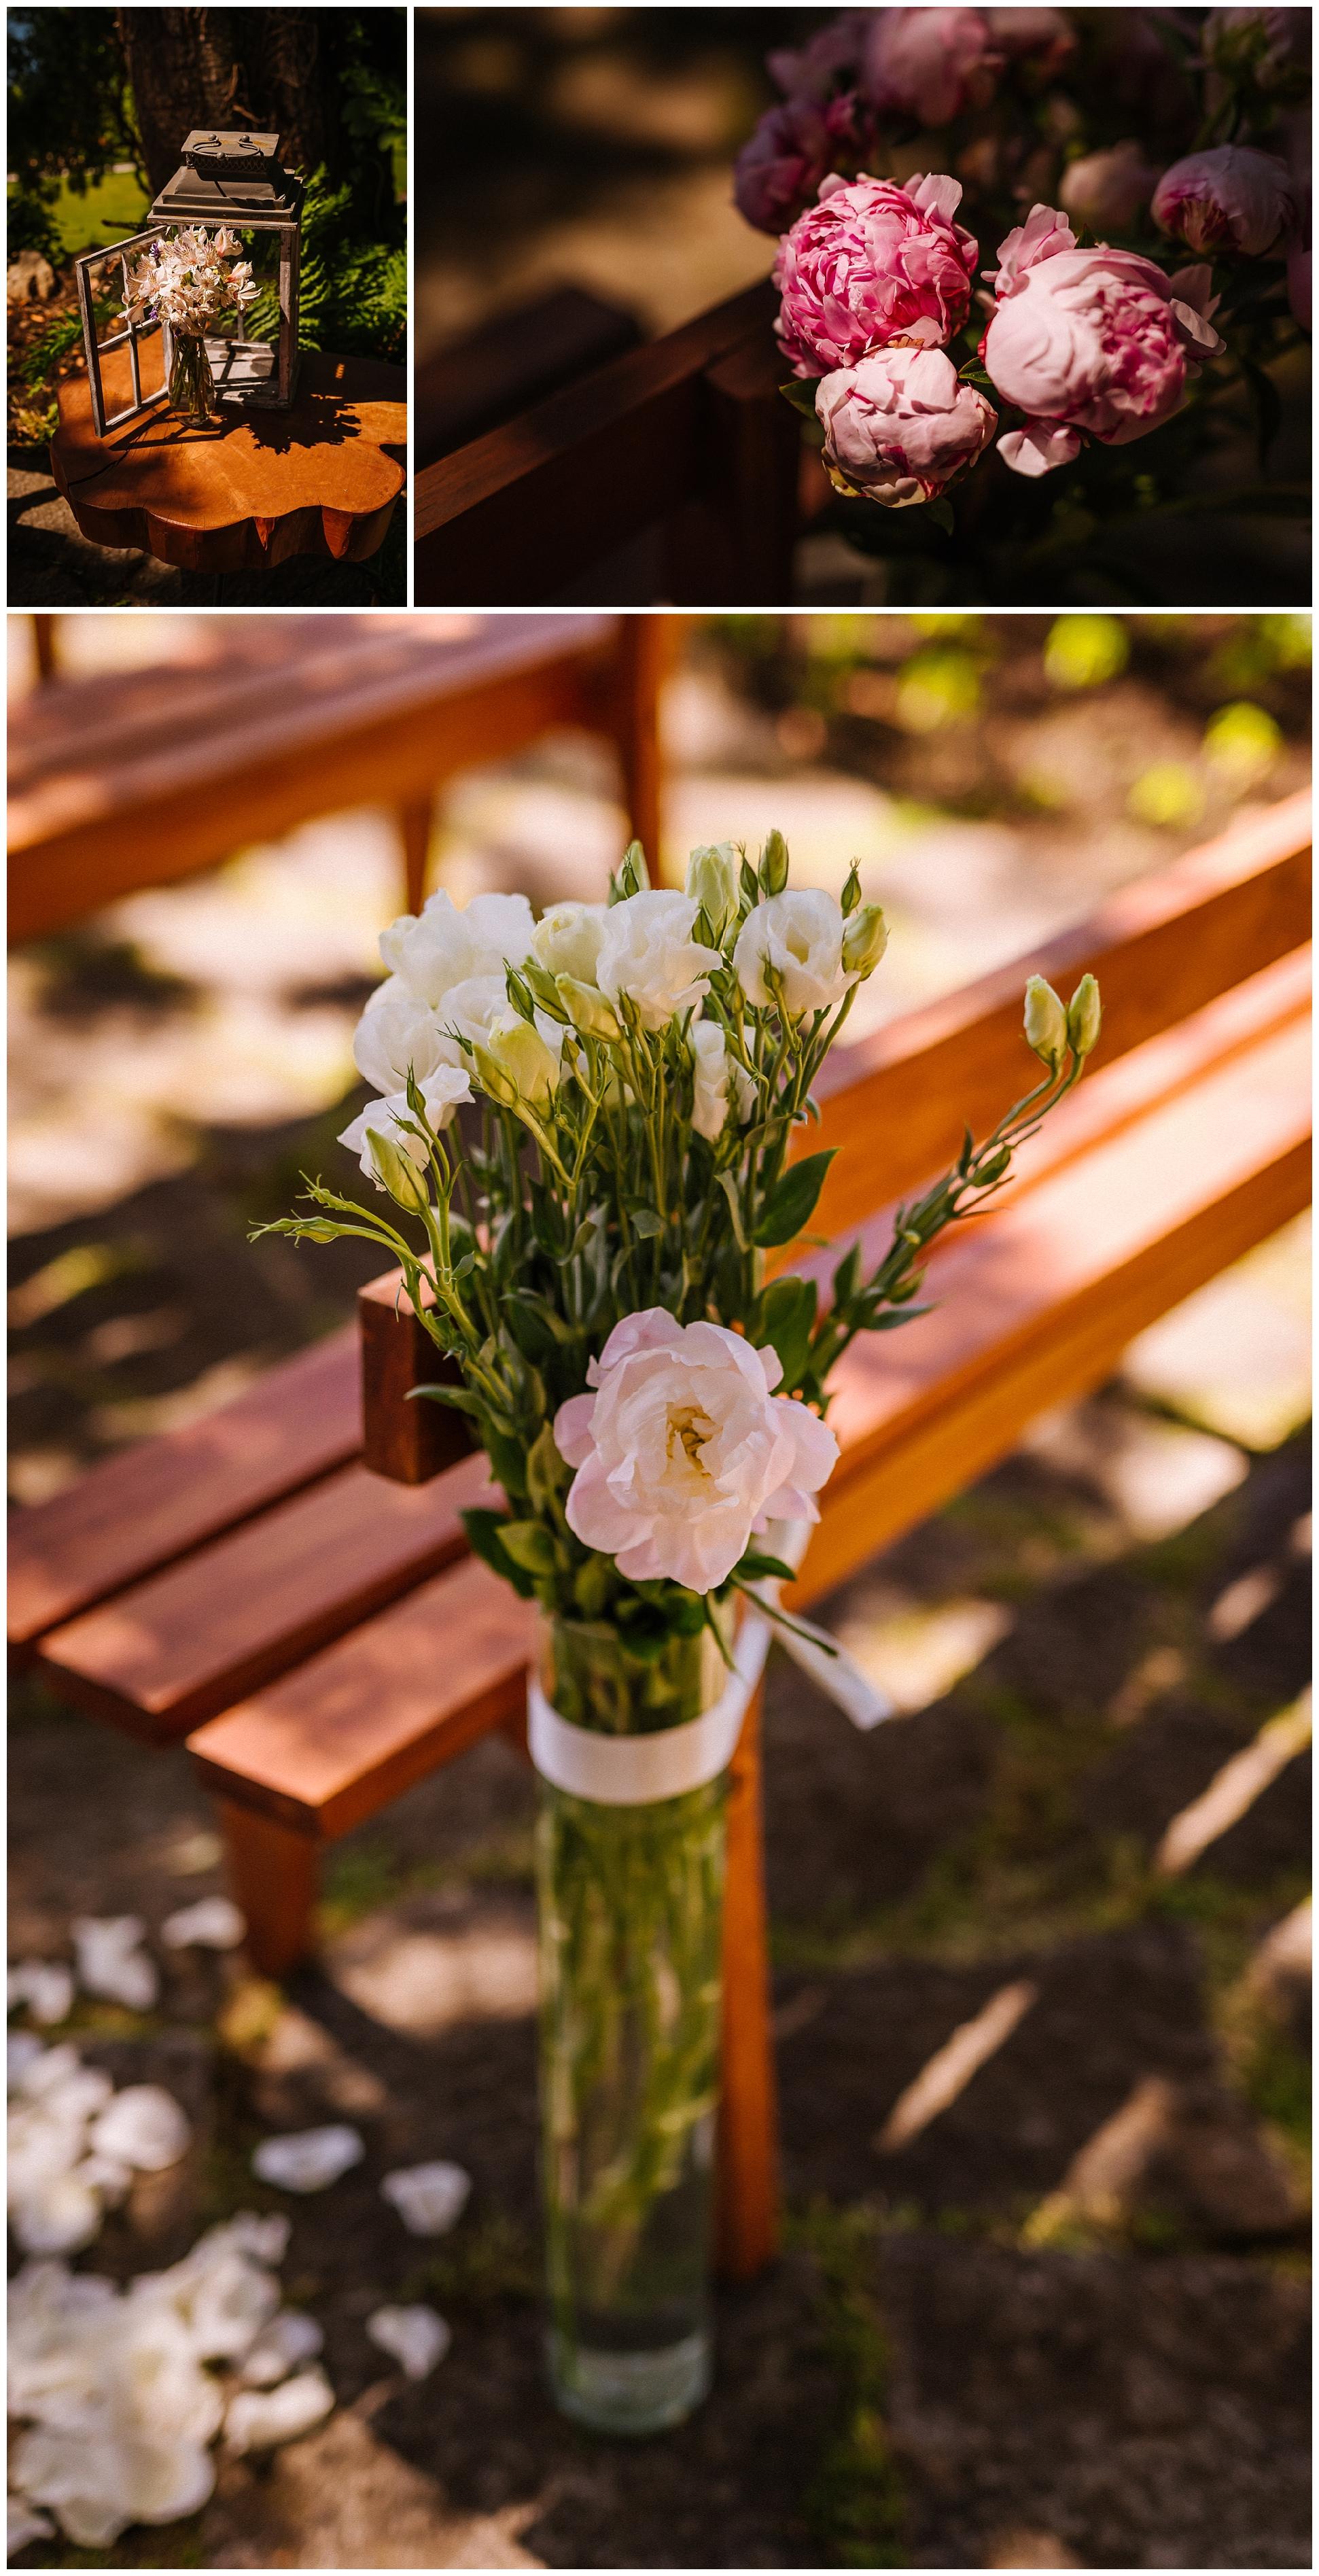 Cheilean-destination-adventure-wedding-florida-patagonia-pucon-santa-cruz-vsco_0065.jpg